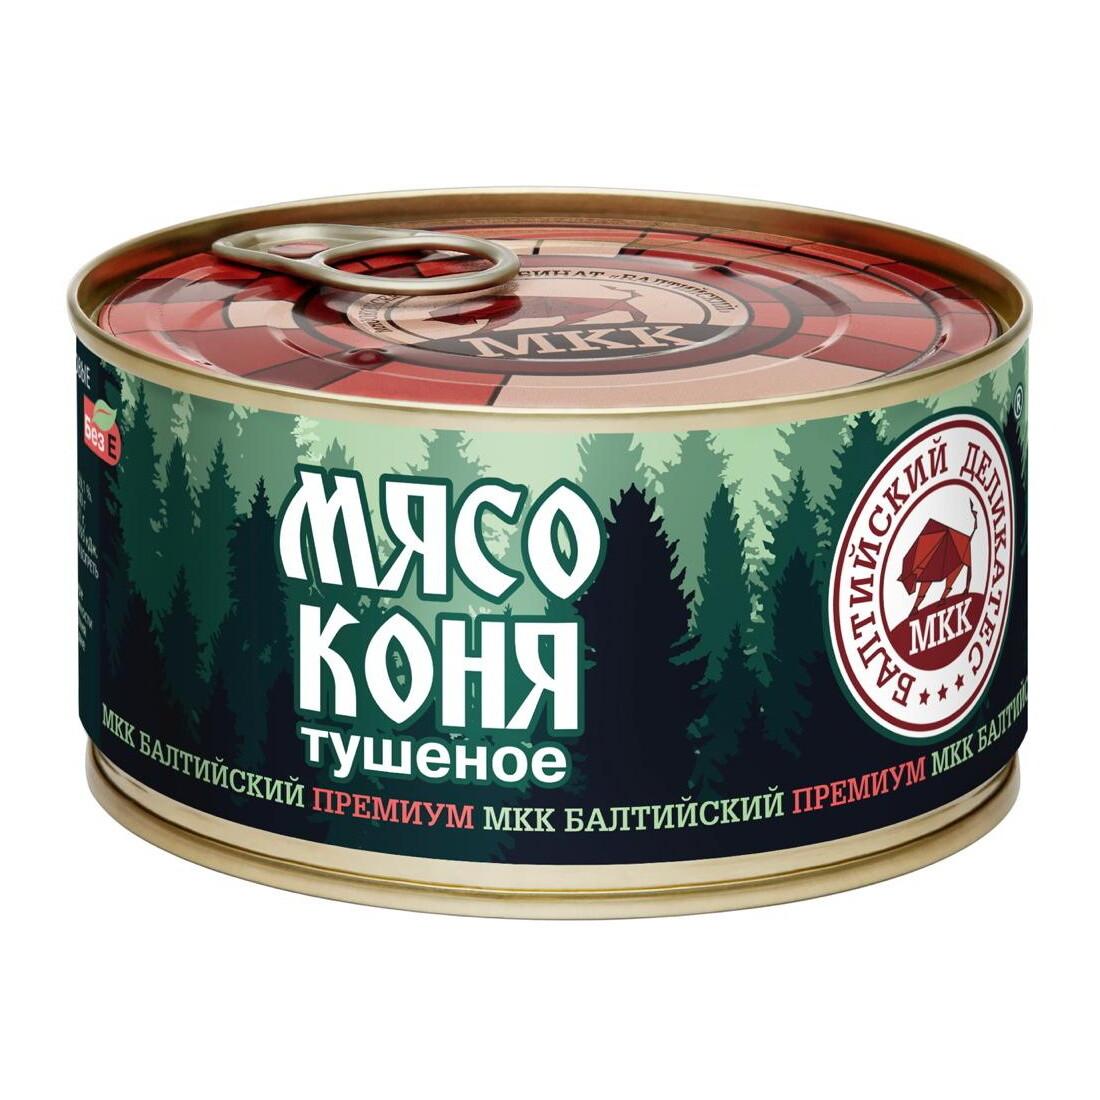 Мясо конины, Балтийский деликатес, 325 гр